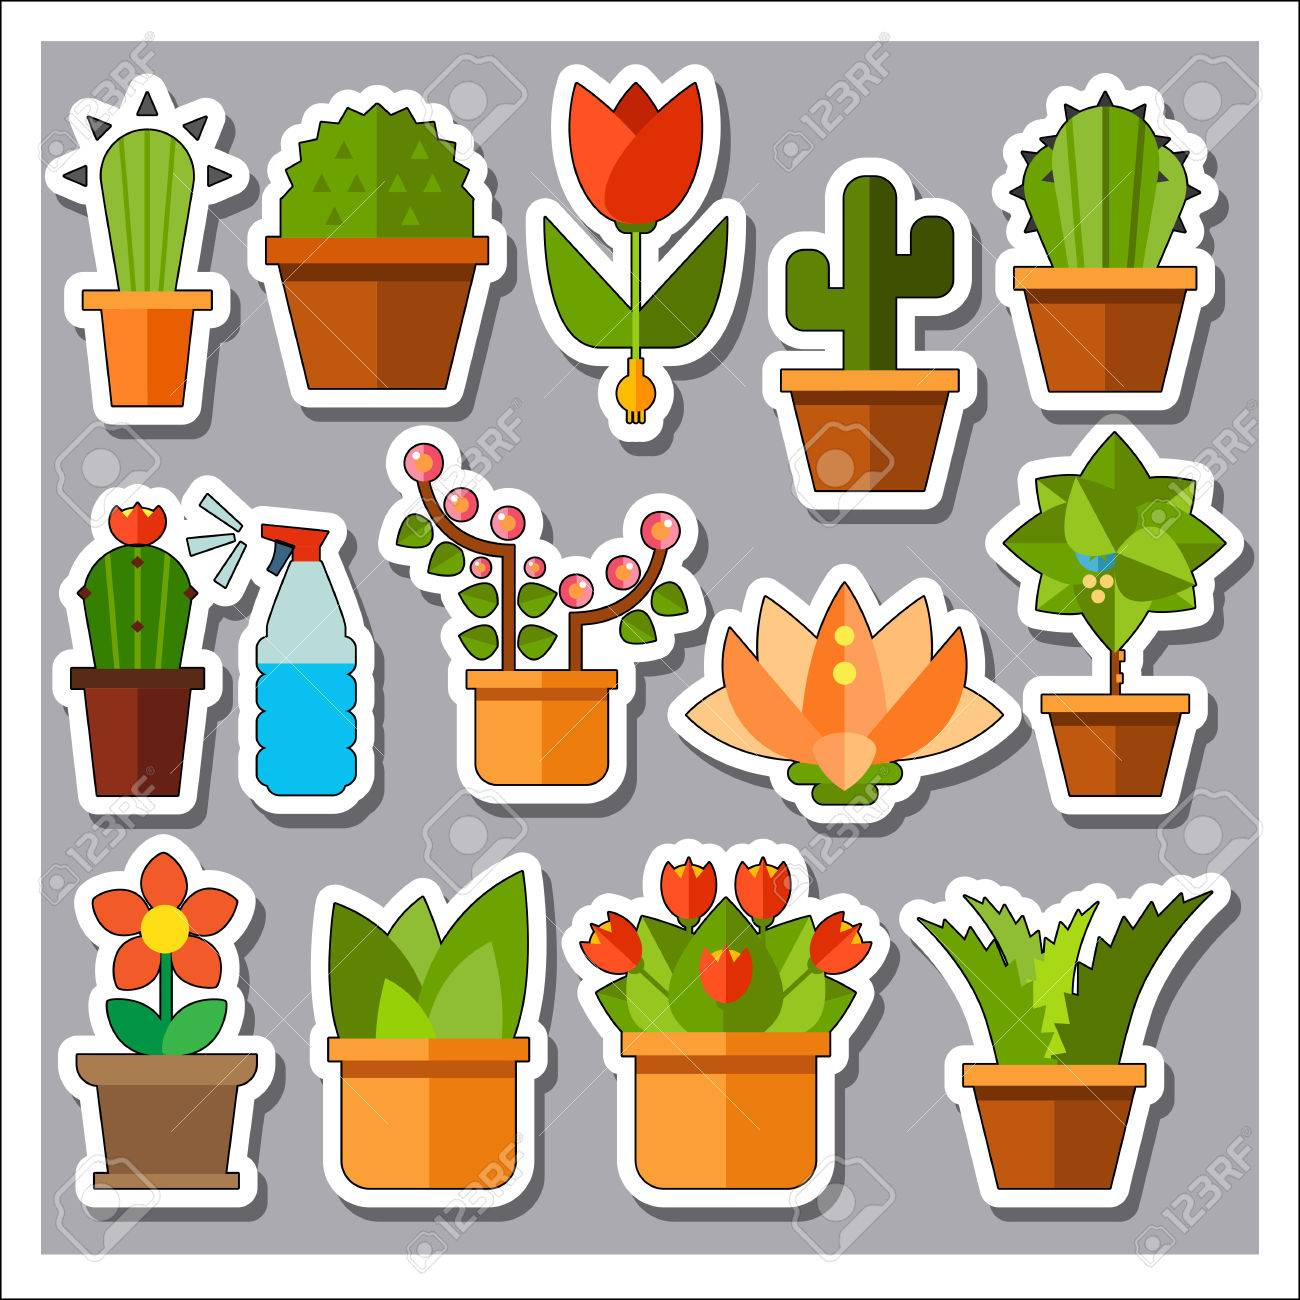 icônes des plantes set. arrosage des plantes cactus aloe vera cactus